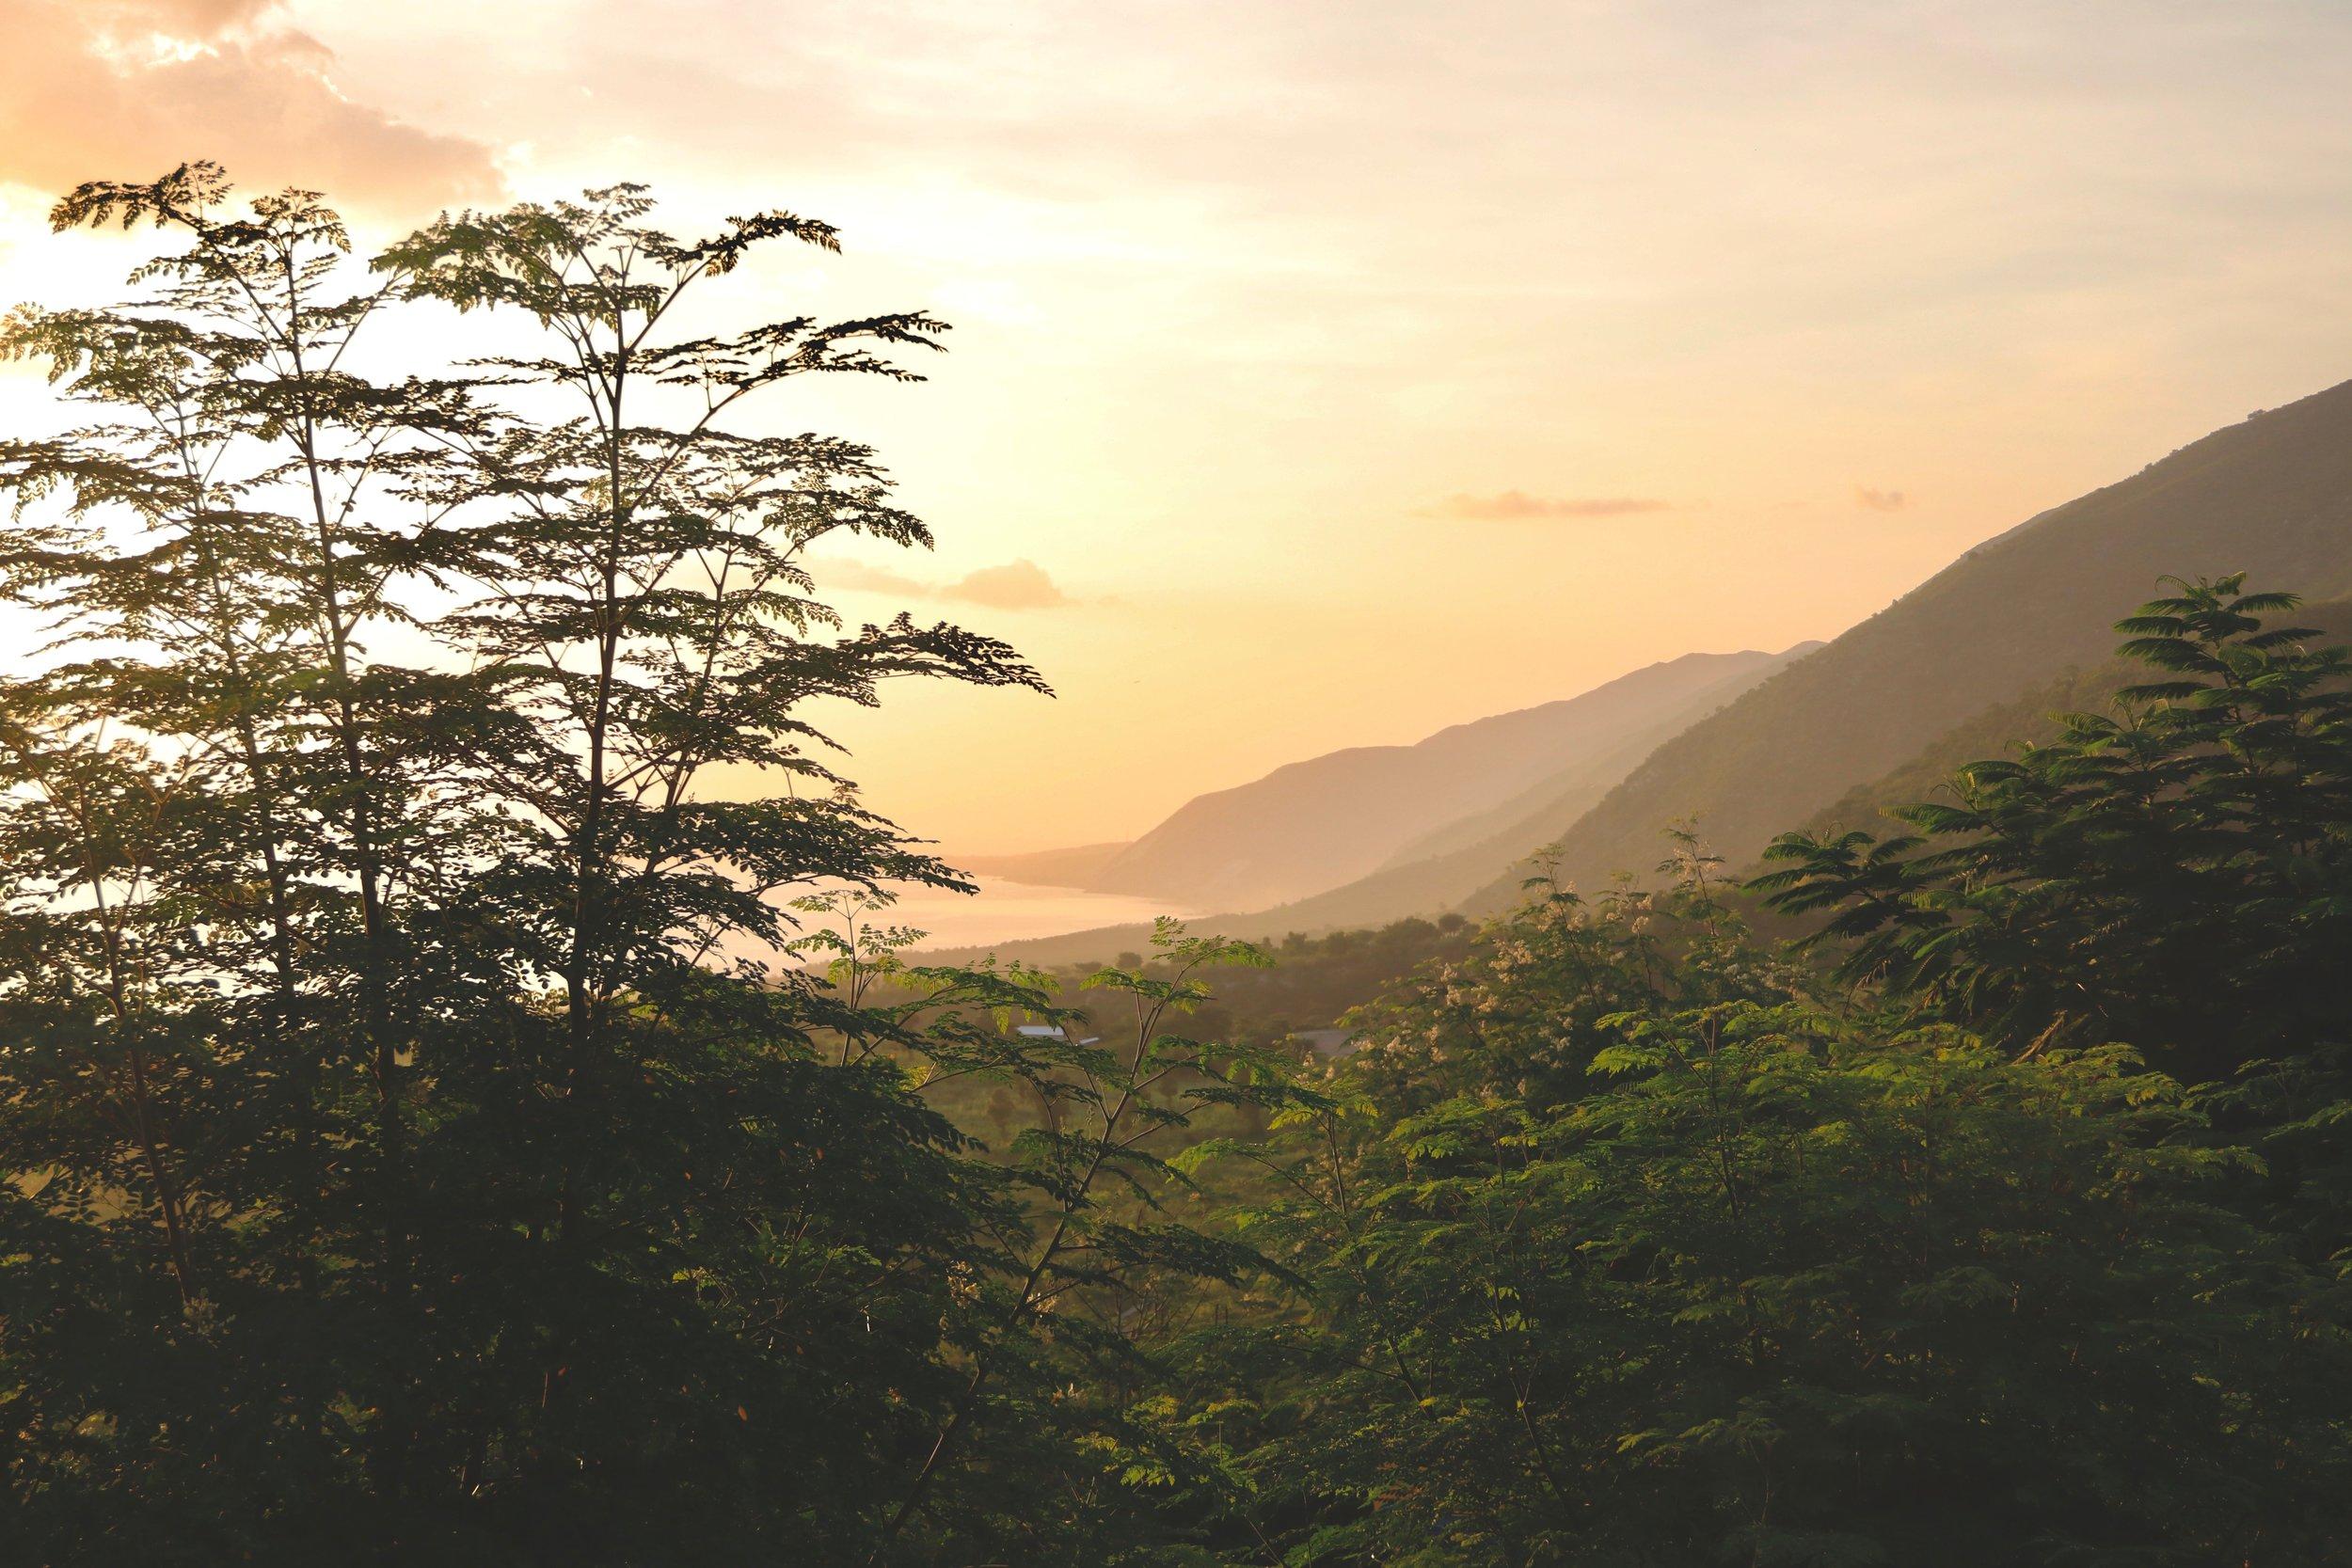 2019 - haiti mission trip